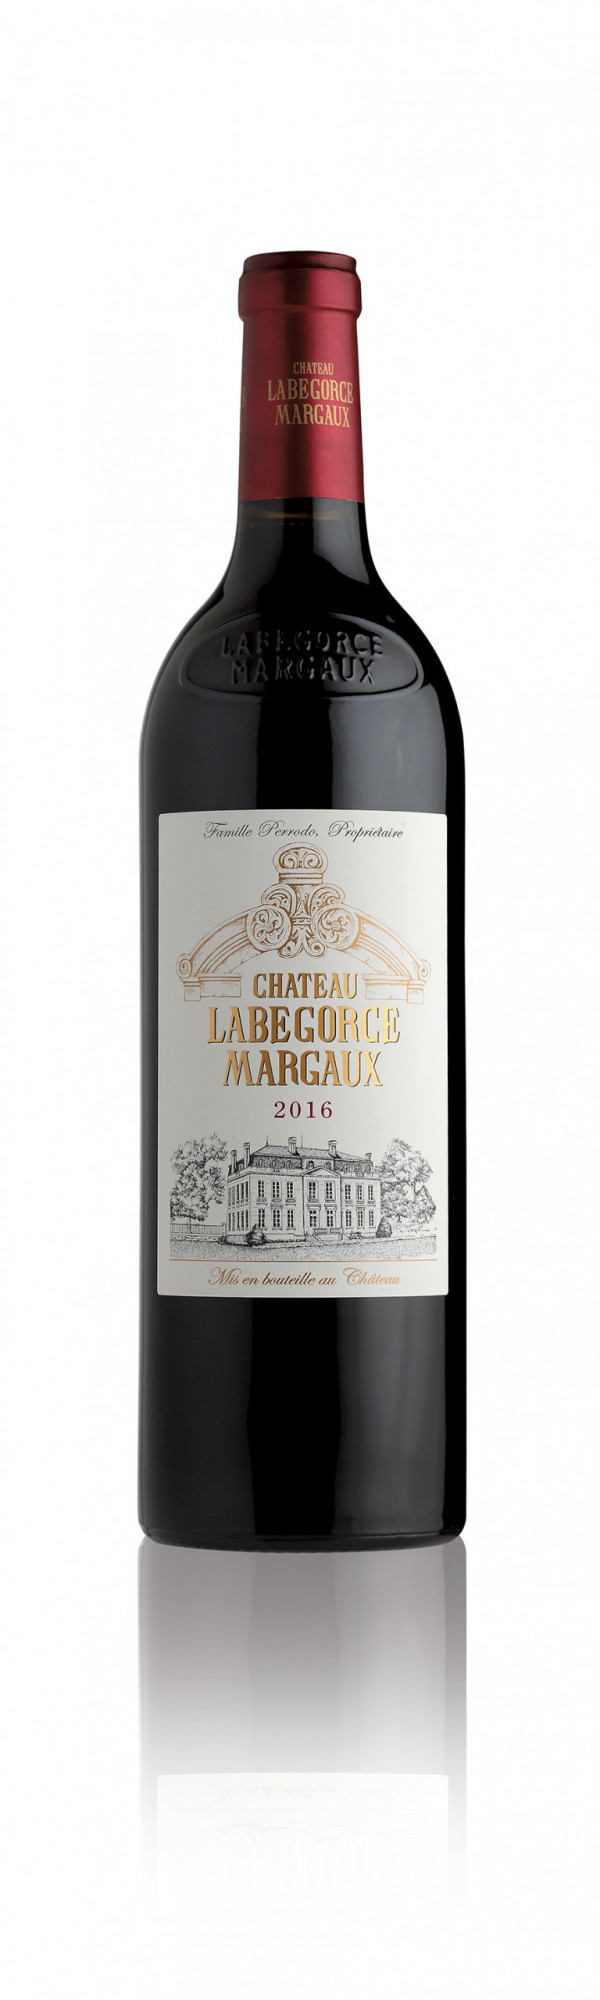 Bouteille Labergorce Margaux